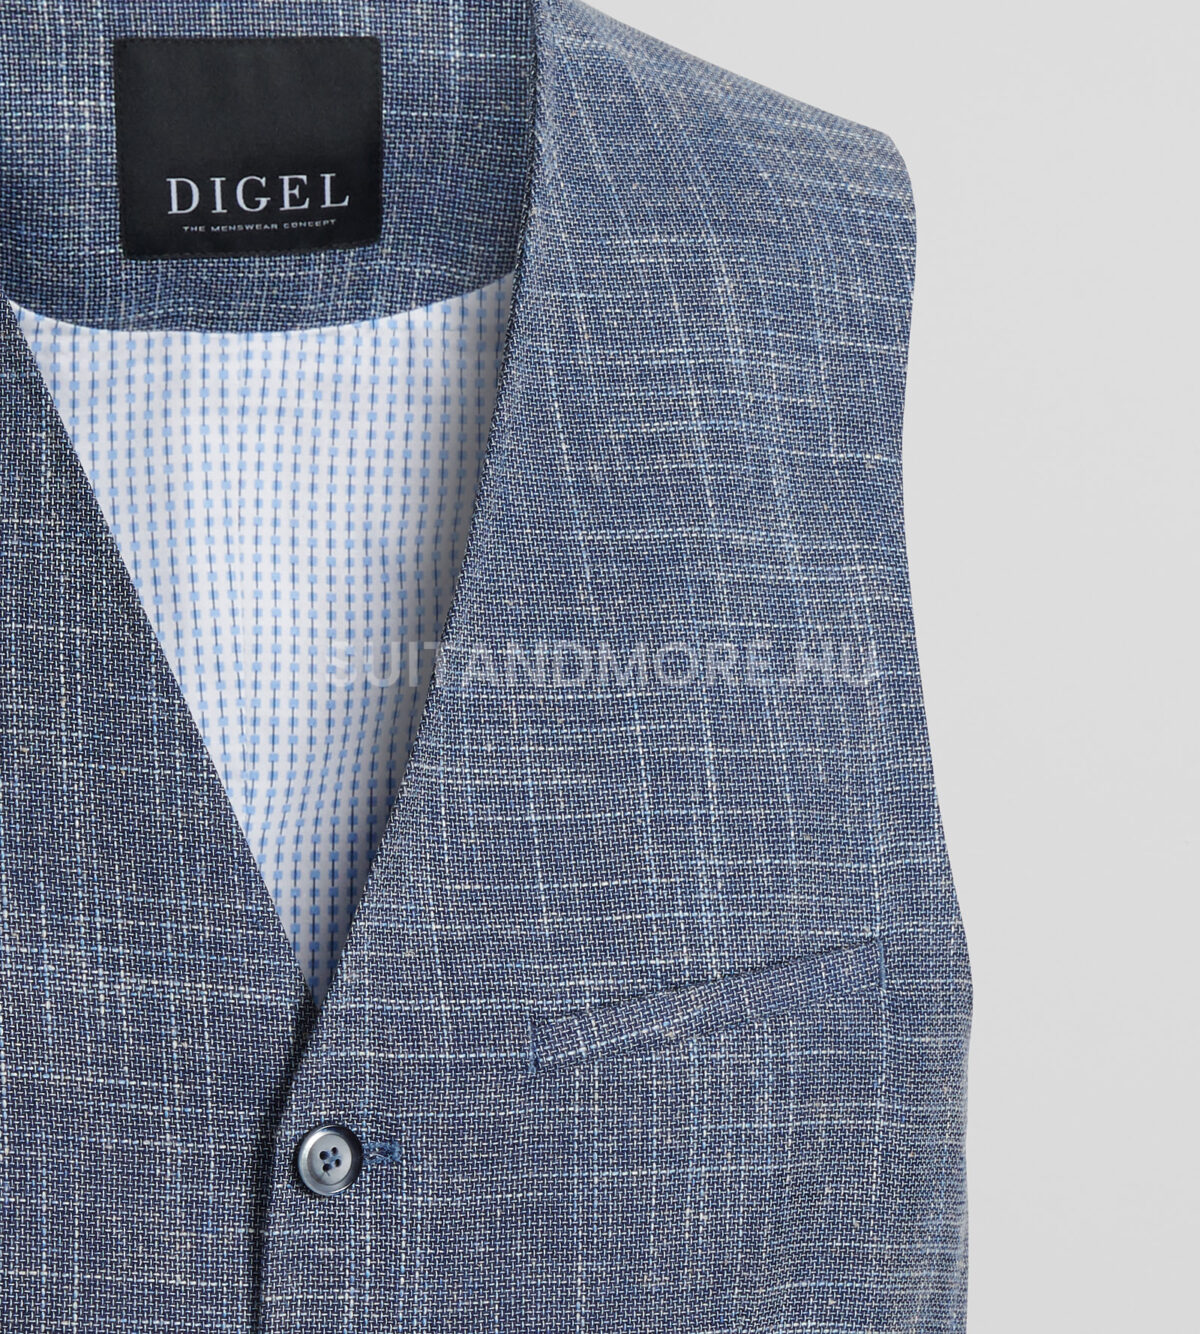 digel-kozepkek-modern-fit-strukturalt-melleny-edgar-1192446-24-02